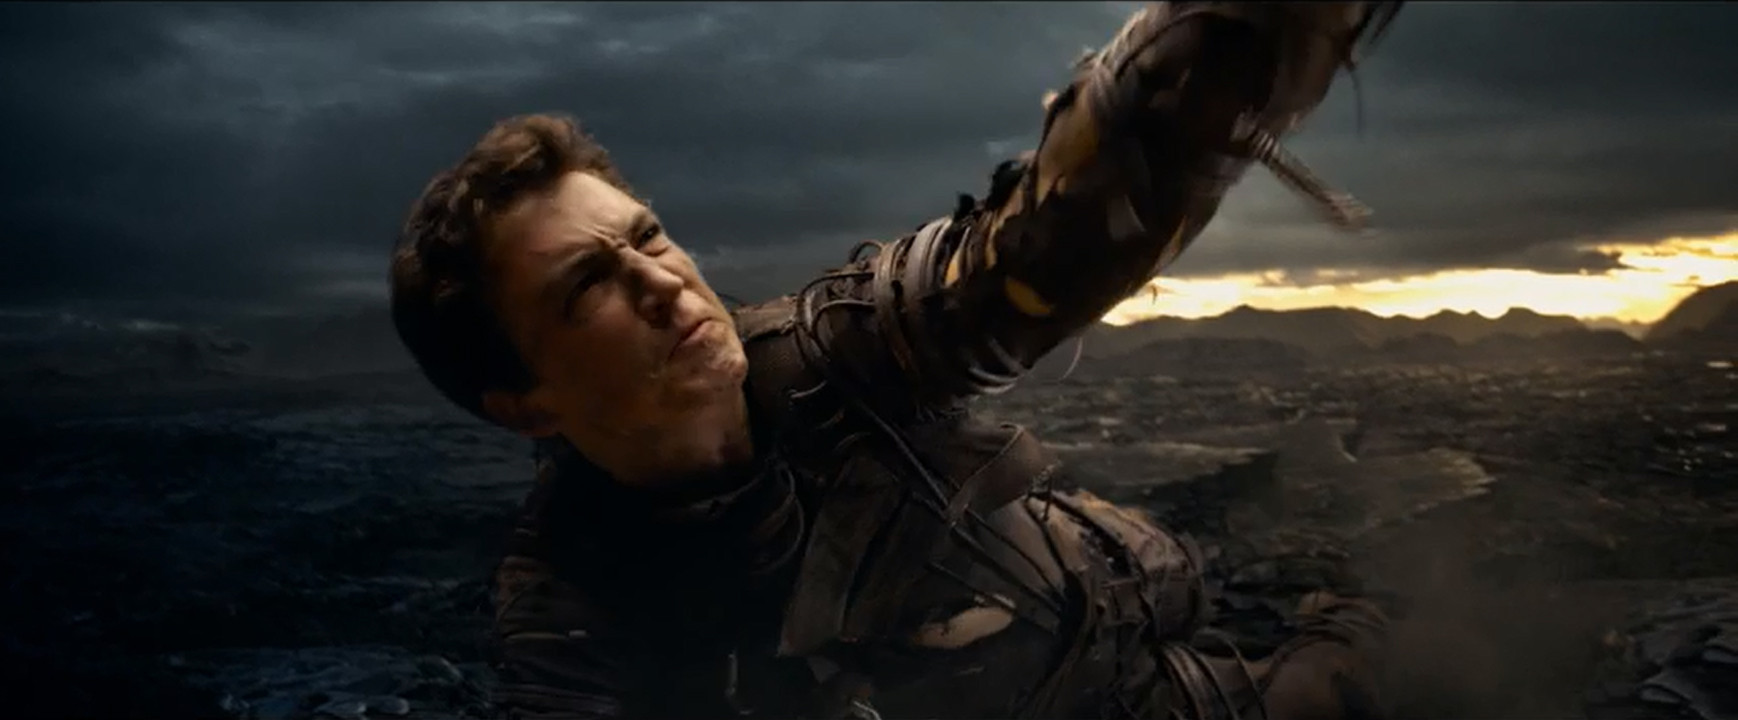 'Fantastic Four' trailer glimpses younger, darker superhero revamp